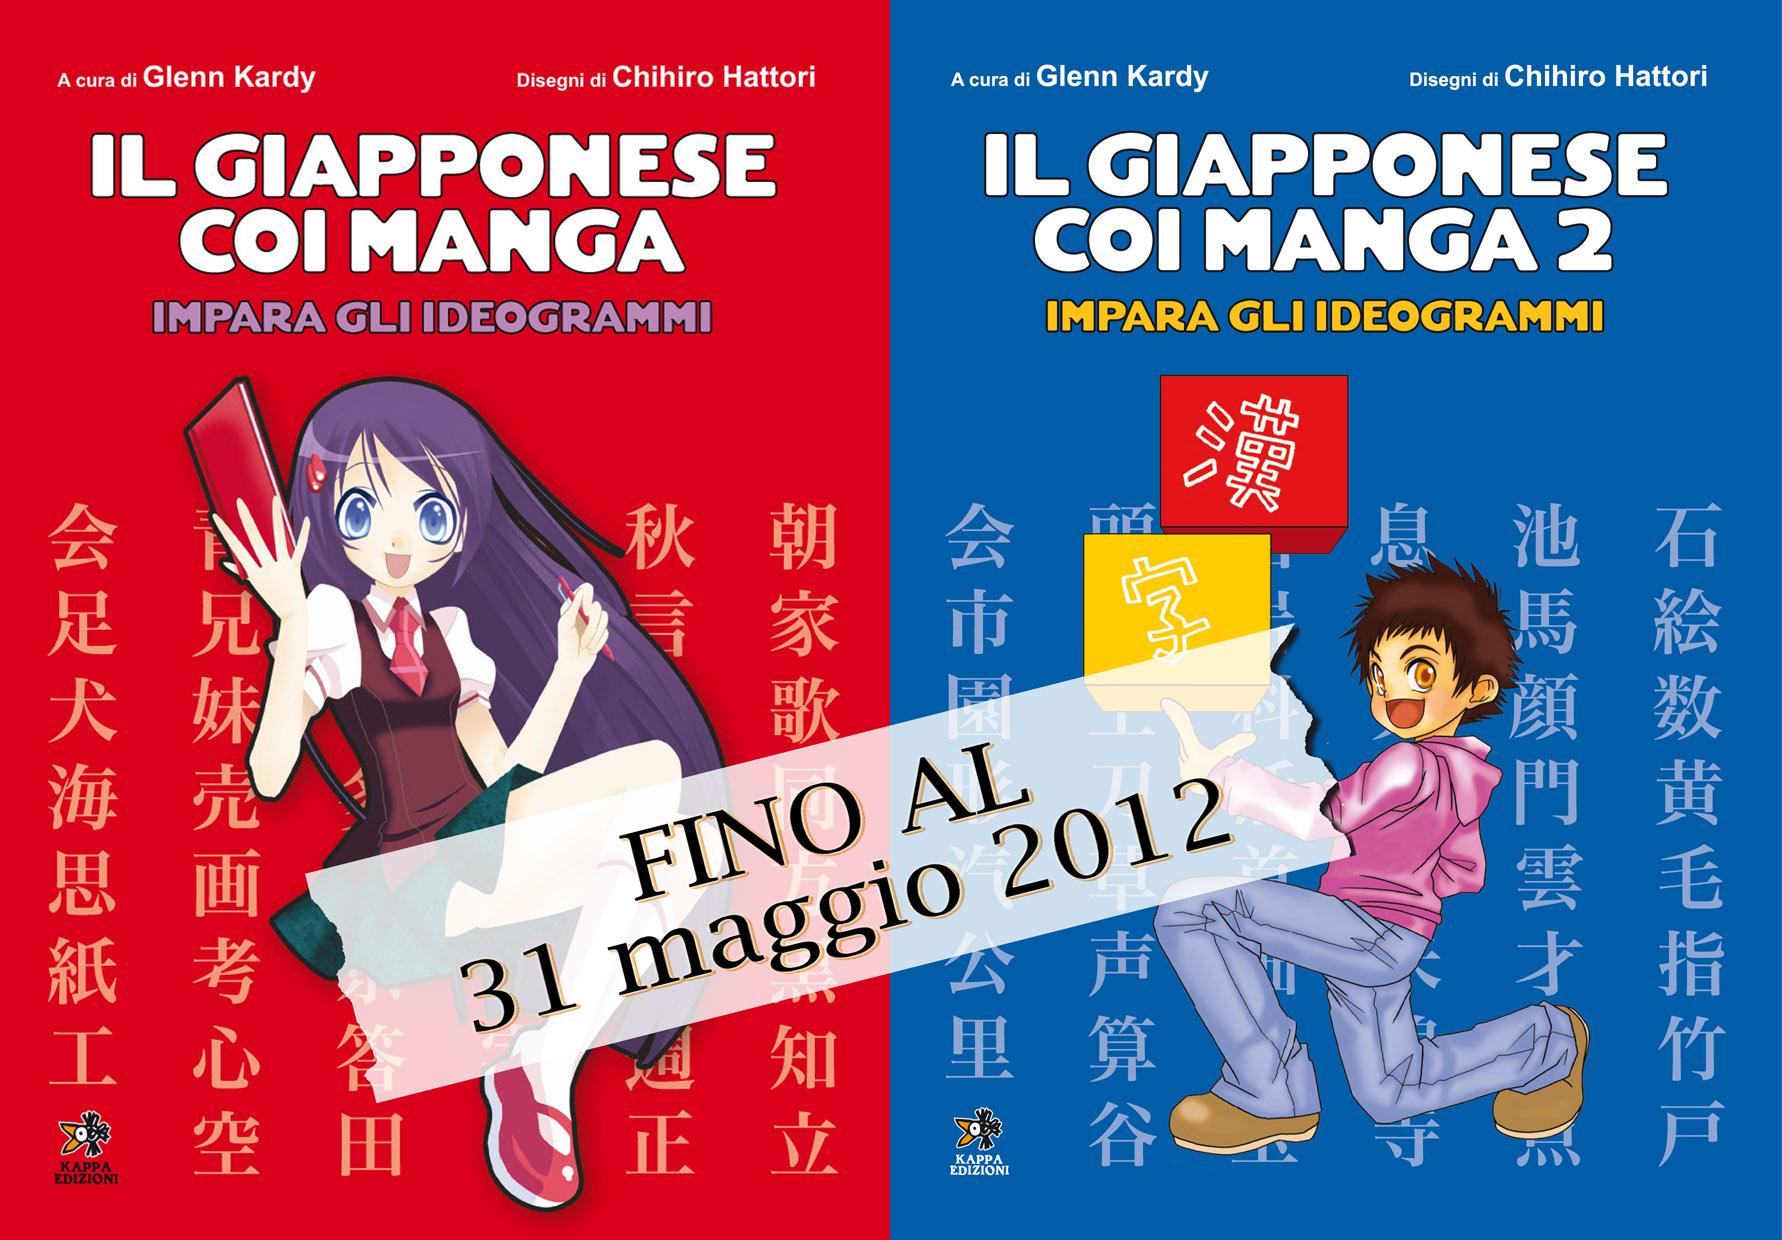 giapponese coi manga